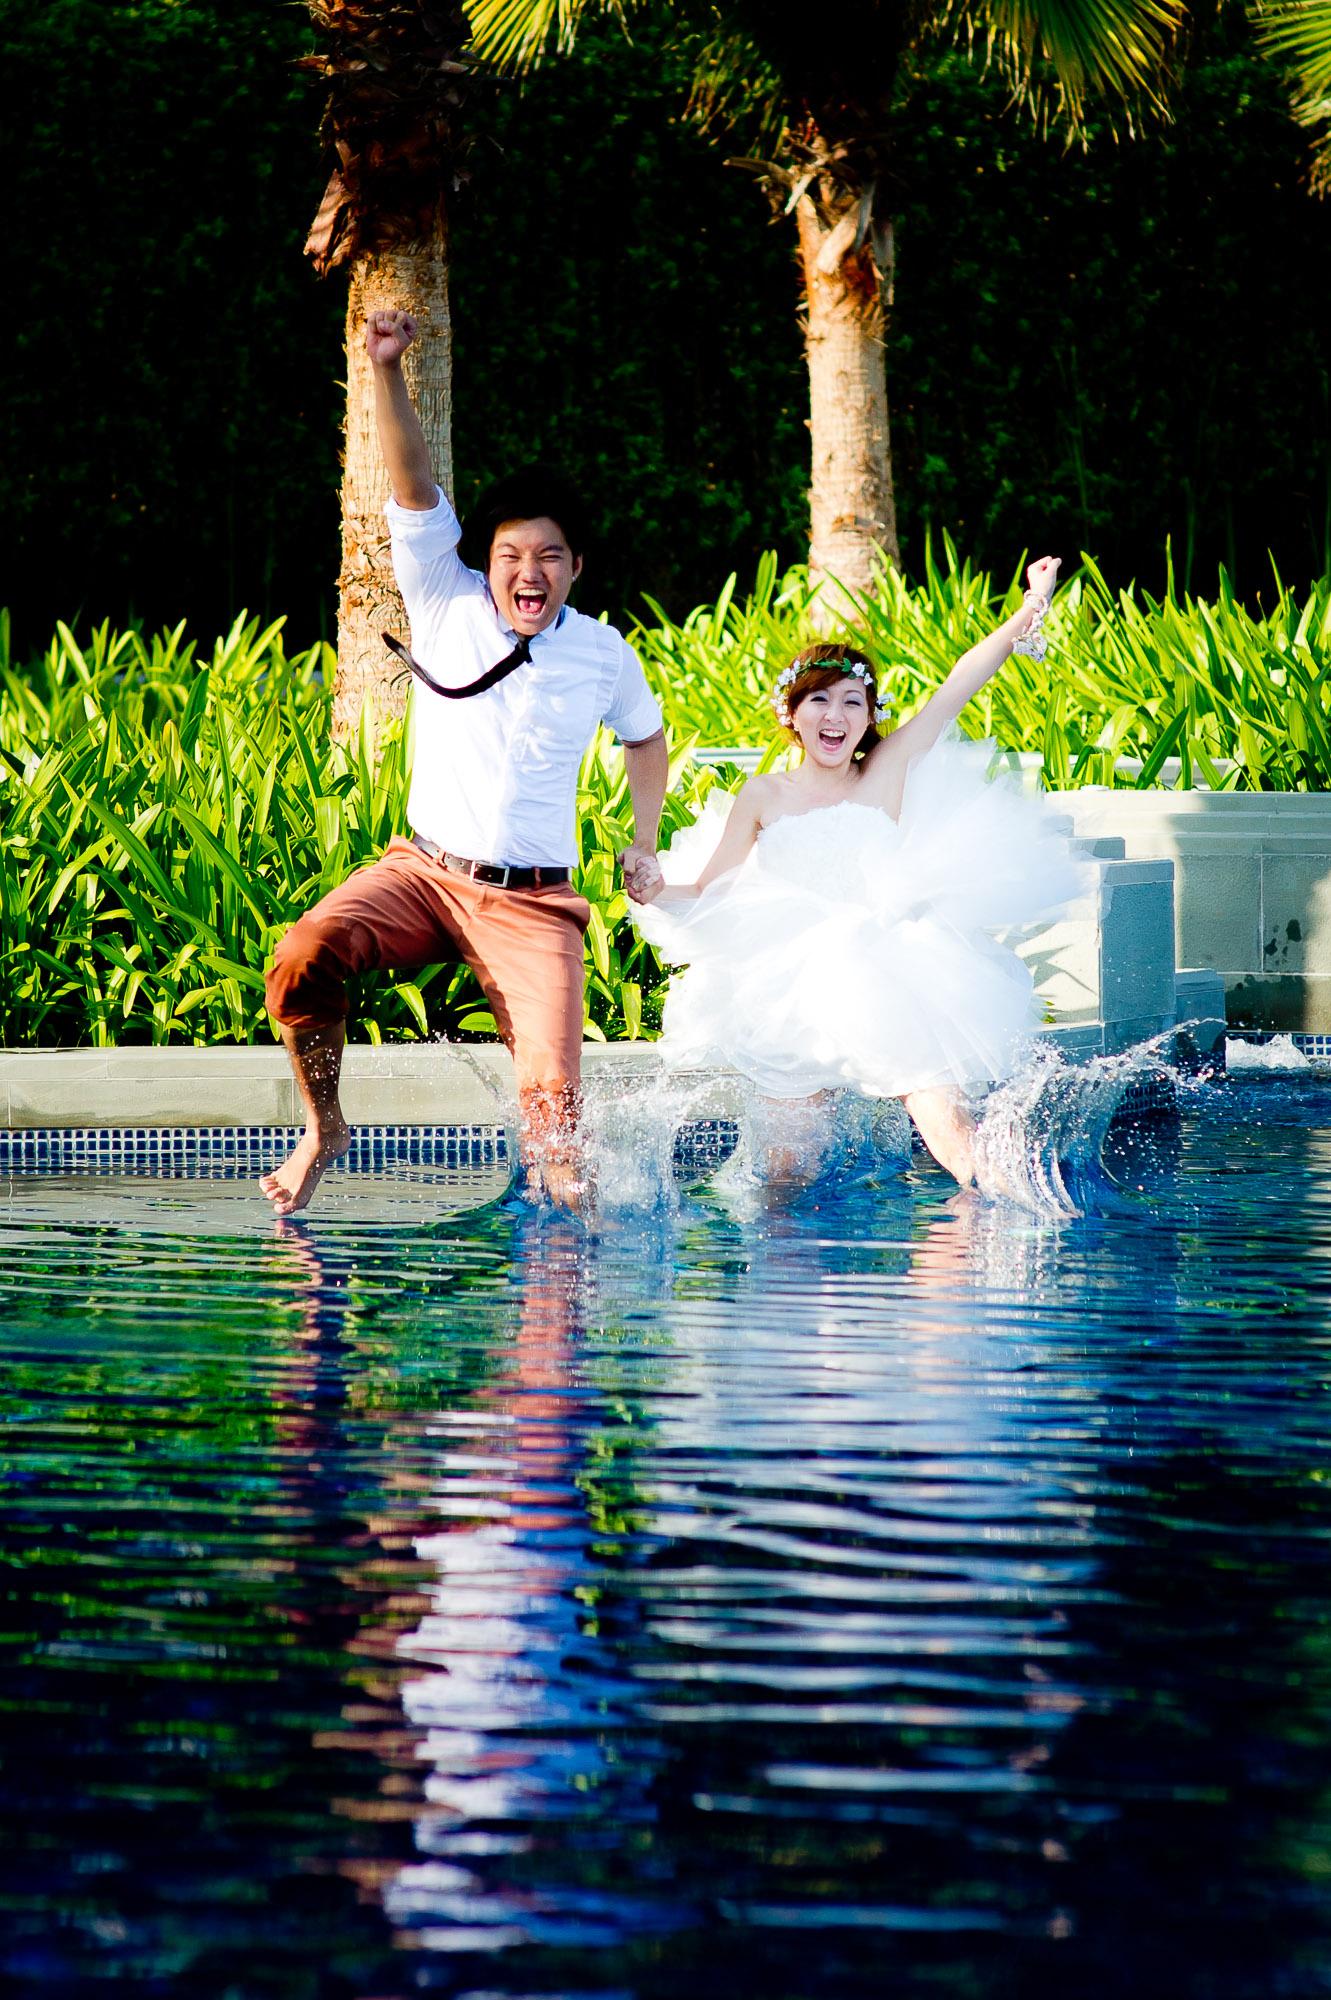 Koh Samui Wedding Photography | Nora Buri Resort and Spa Pre-Wedding Photography